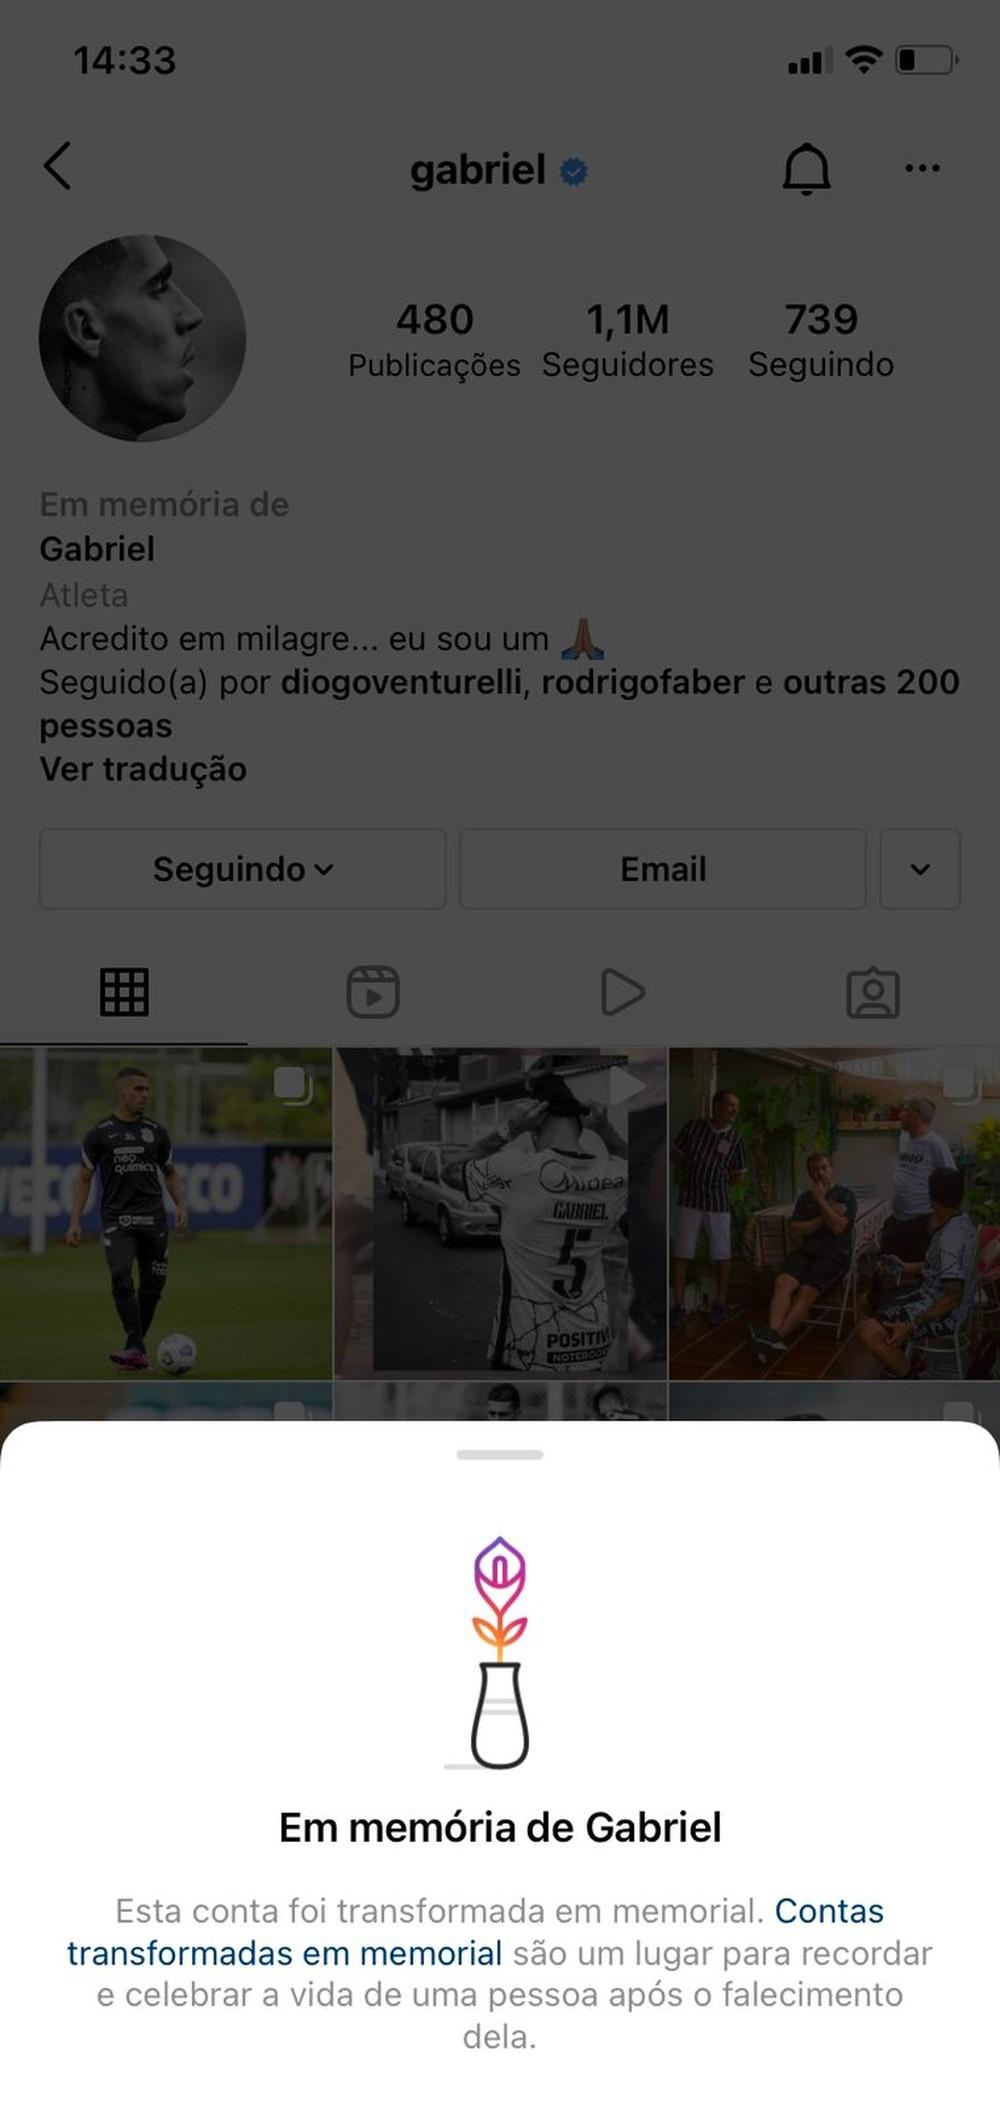 Conta de Instagram de Gabriel virá pagina de pessoa morta, Corinthians fala de ataque de hacker